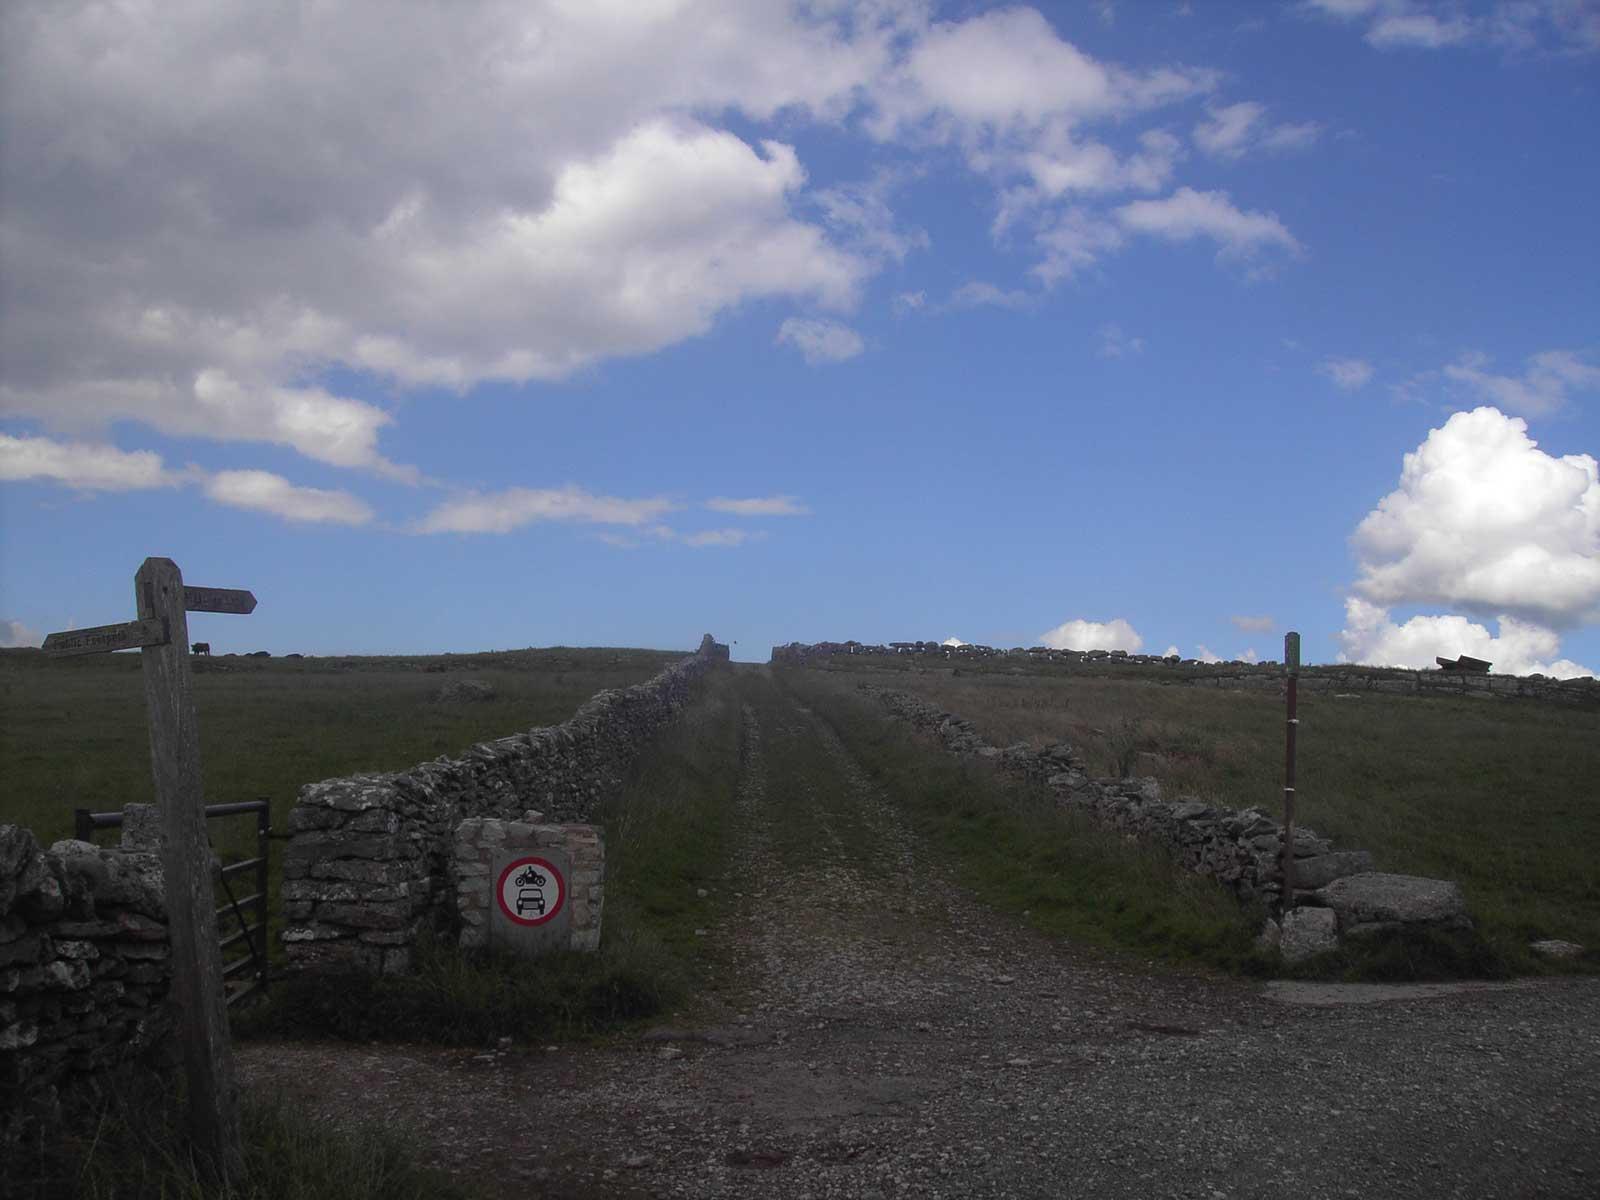 Hetton - Malham Moor via Mastiles Lane Bike Route